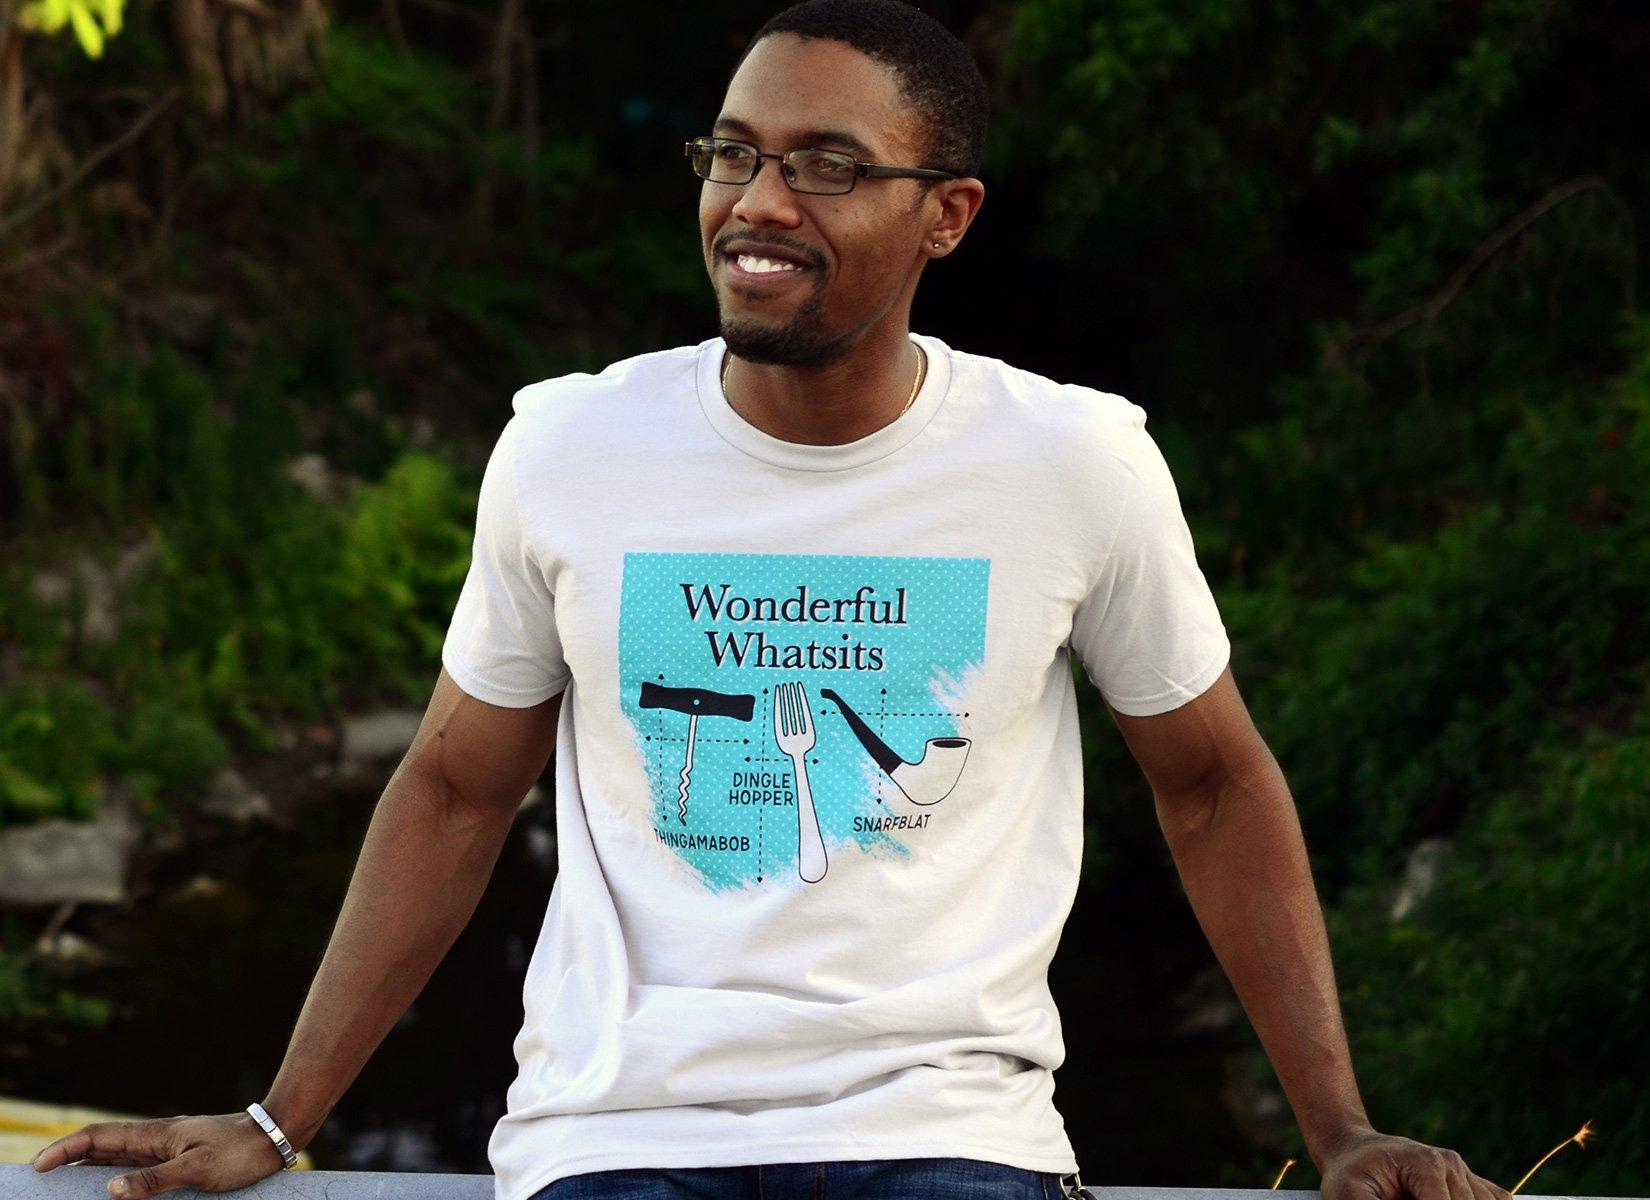 Wonderful Whatsits on Mens T-Shirt